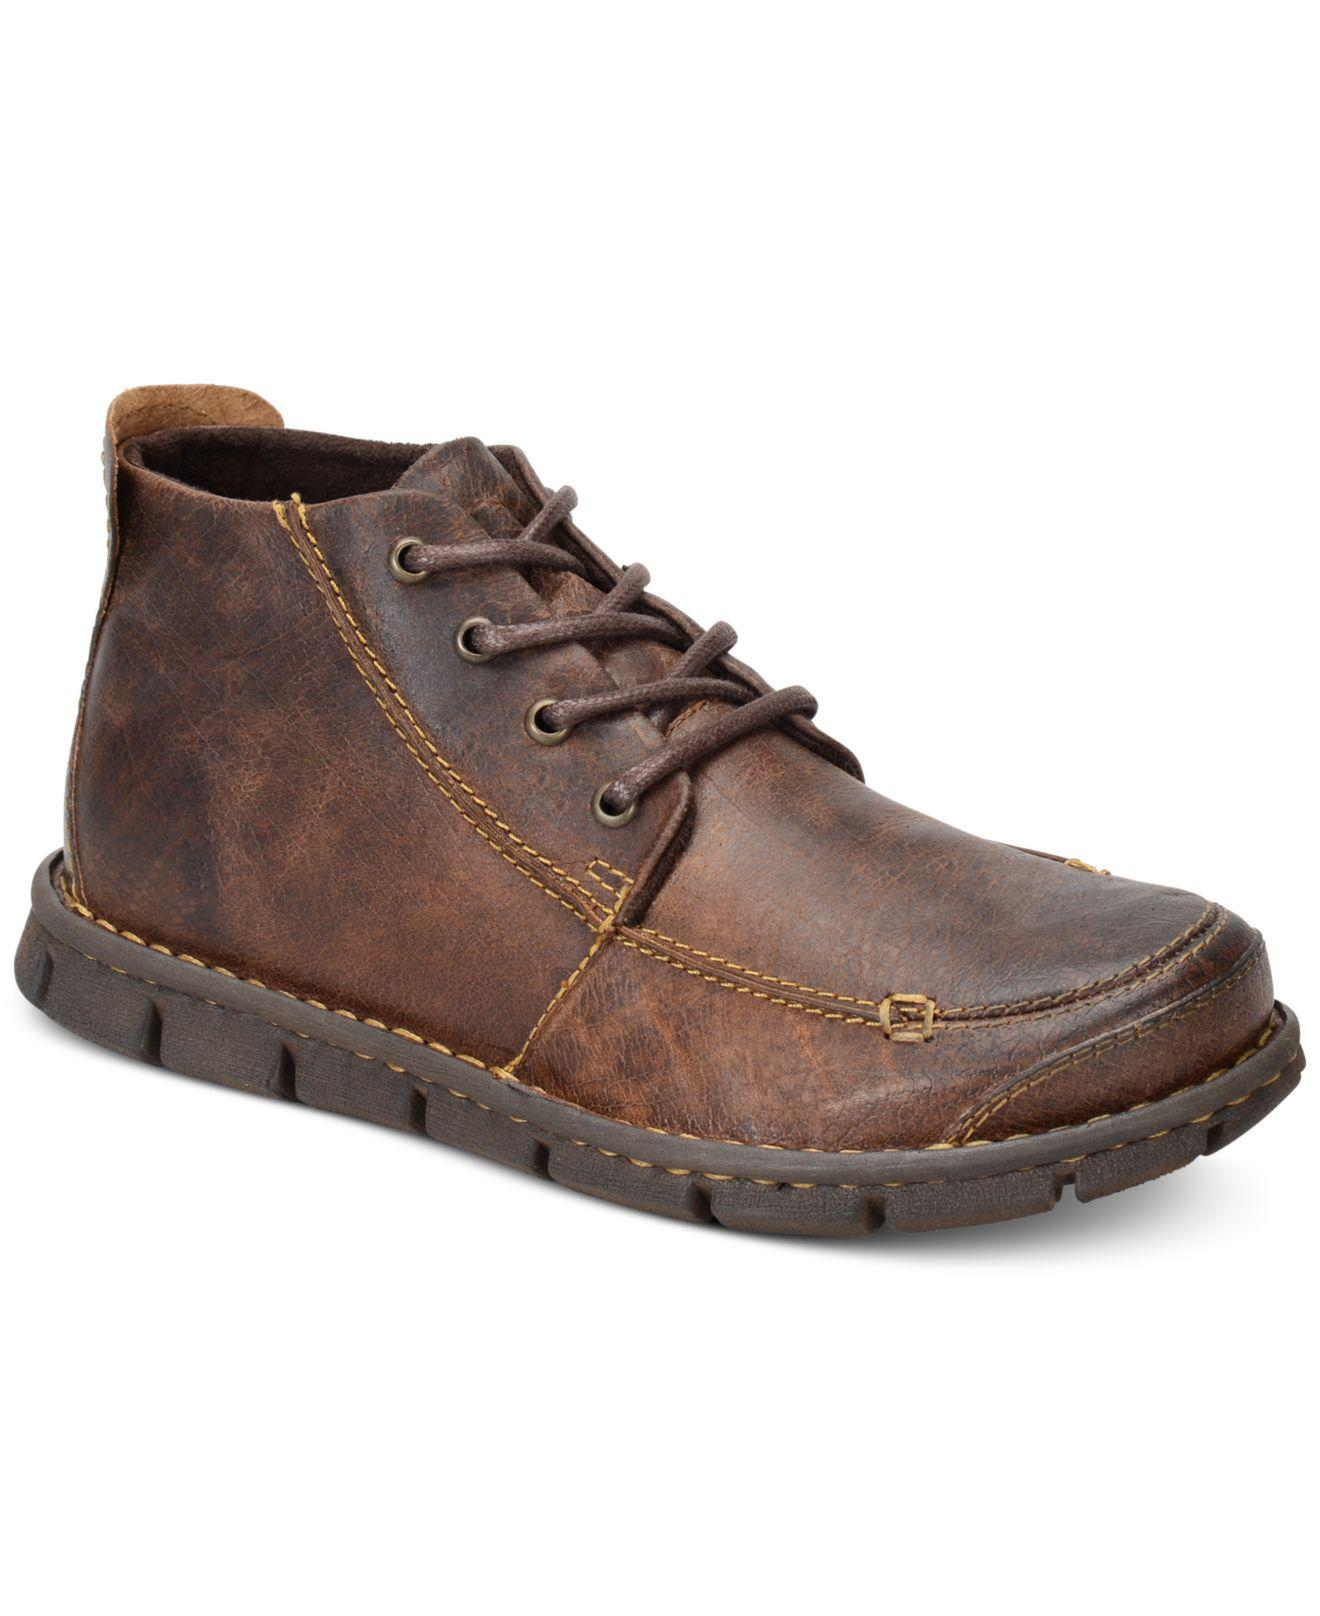 b159a2e17db Born Brown Men's Neuman Moc-toe Chukka Boots for men